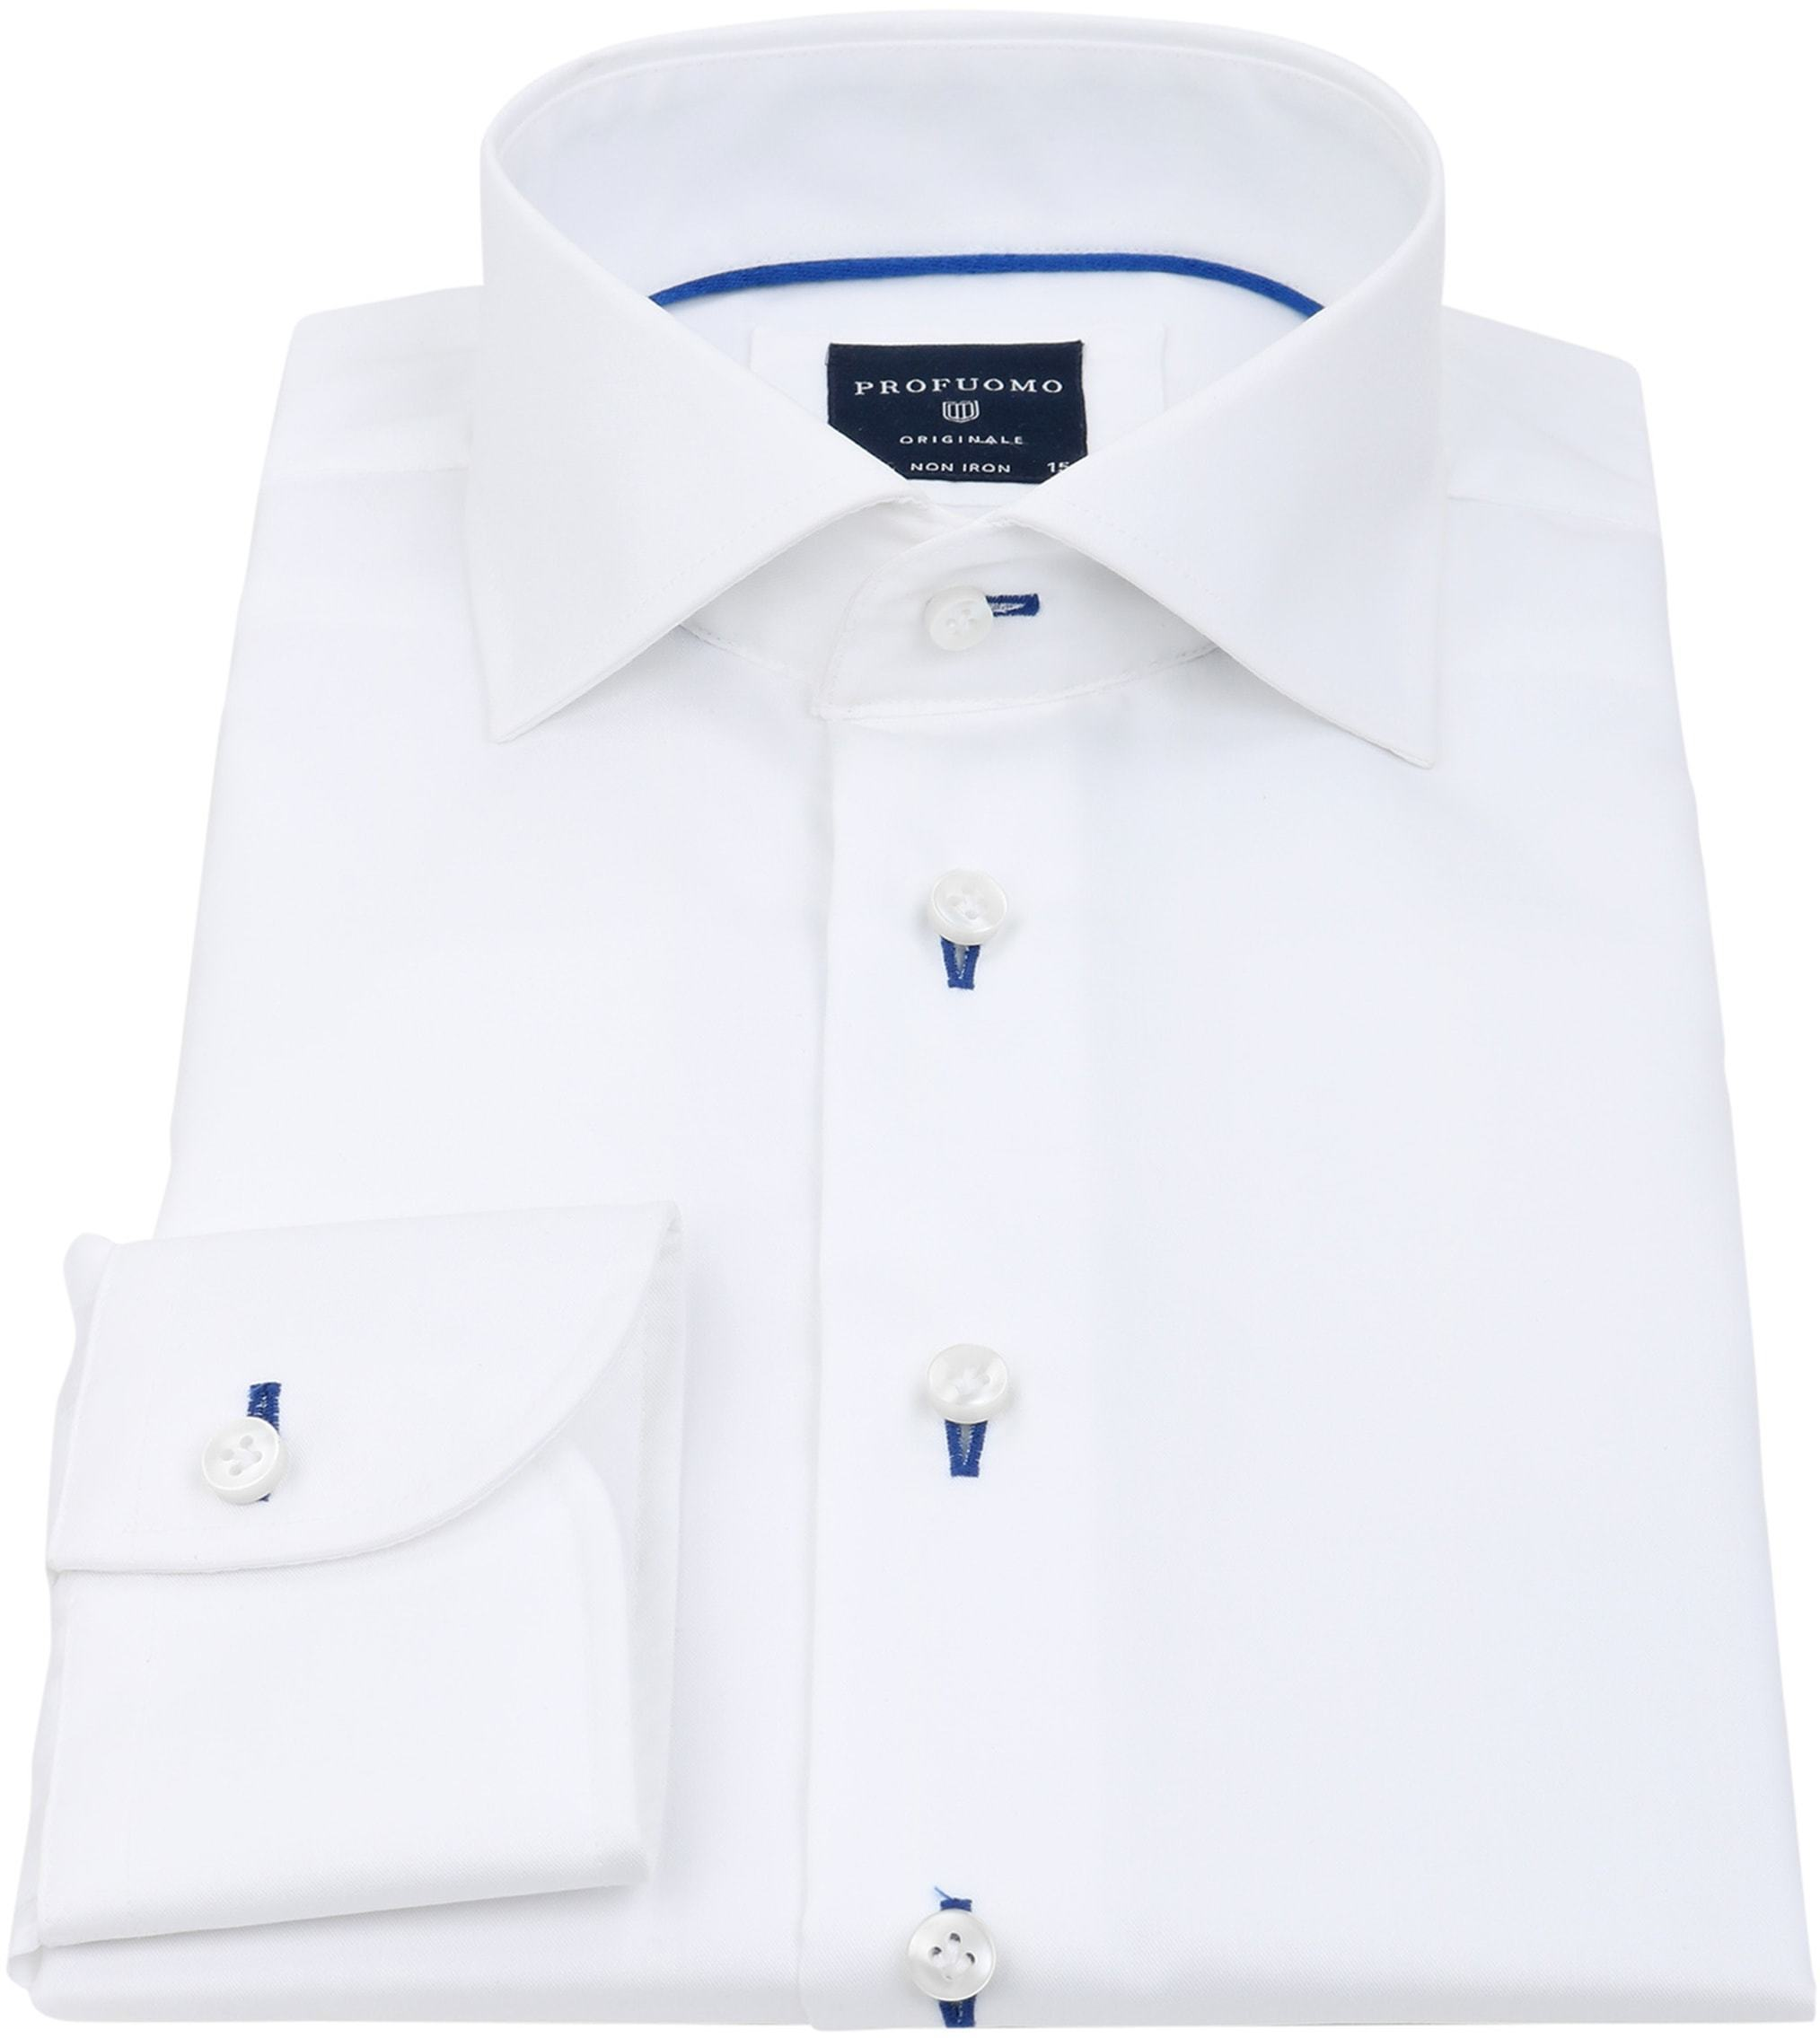 Profuomo Slim Fit Overhemd Wit Non Iron foto 1